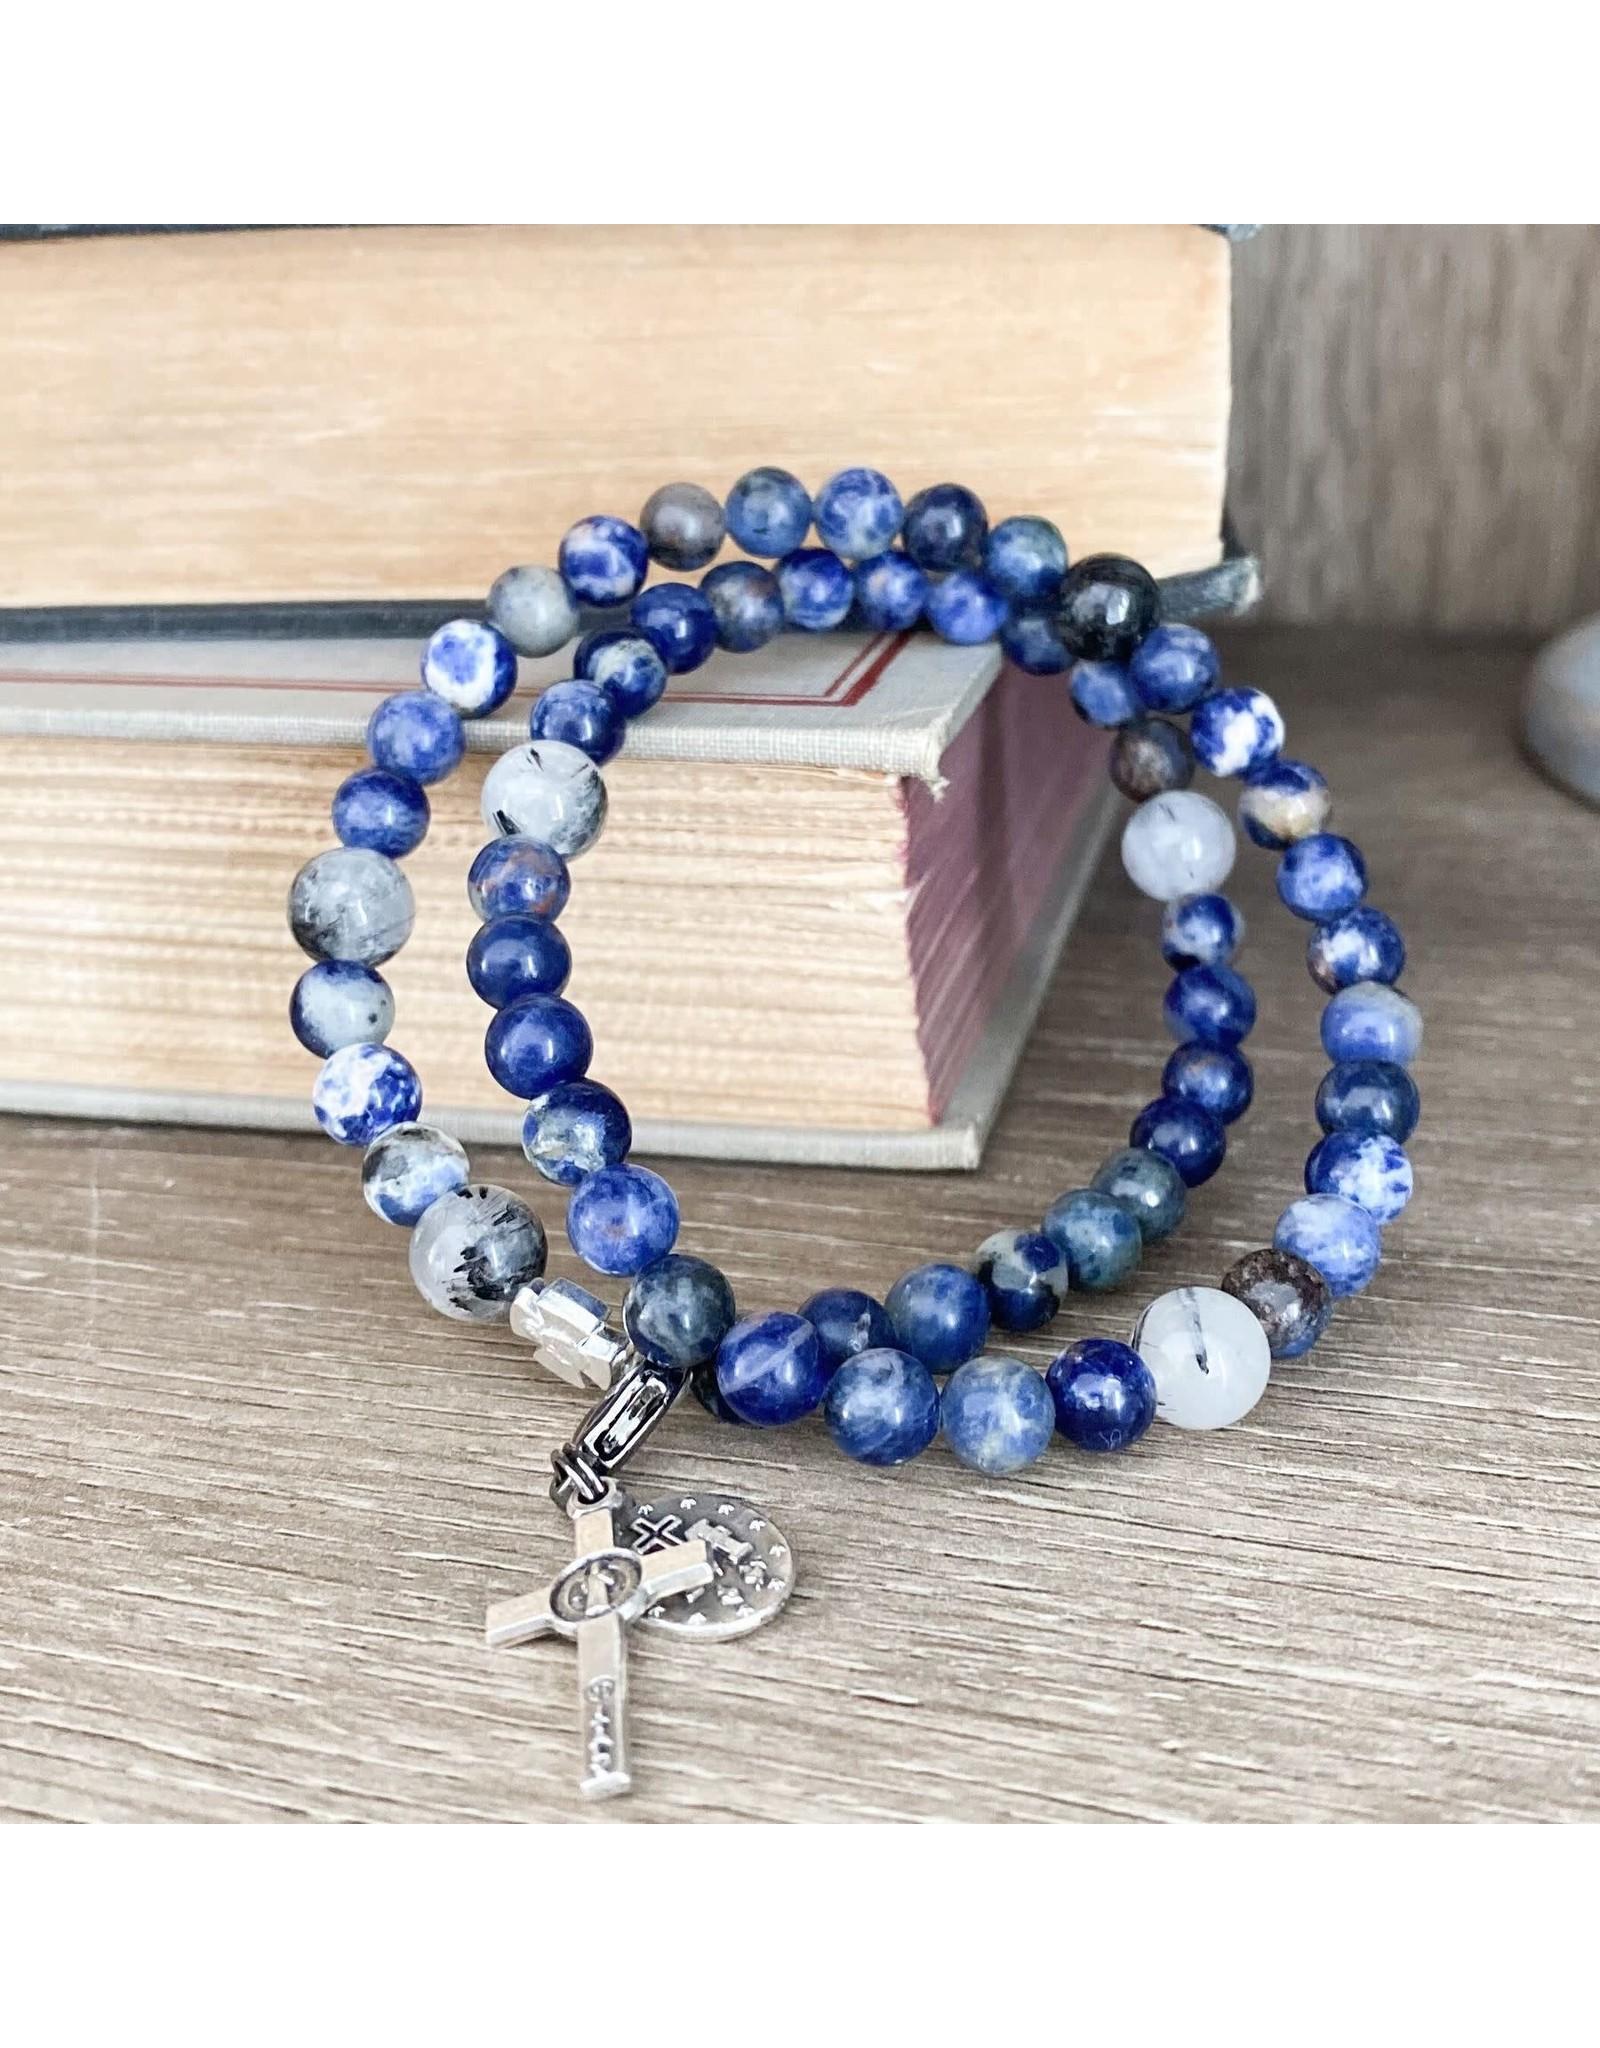 Chews Life Calcutta   Stretch & Wrap Rosary Bracelet   Medium